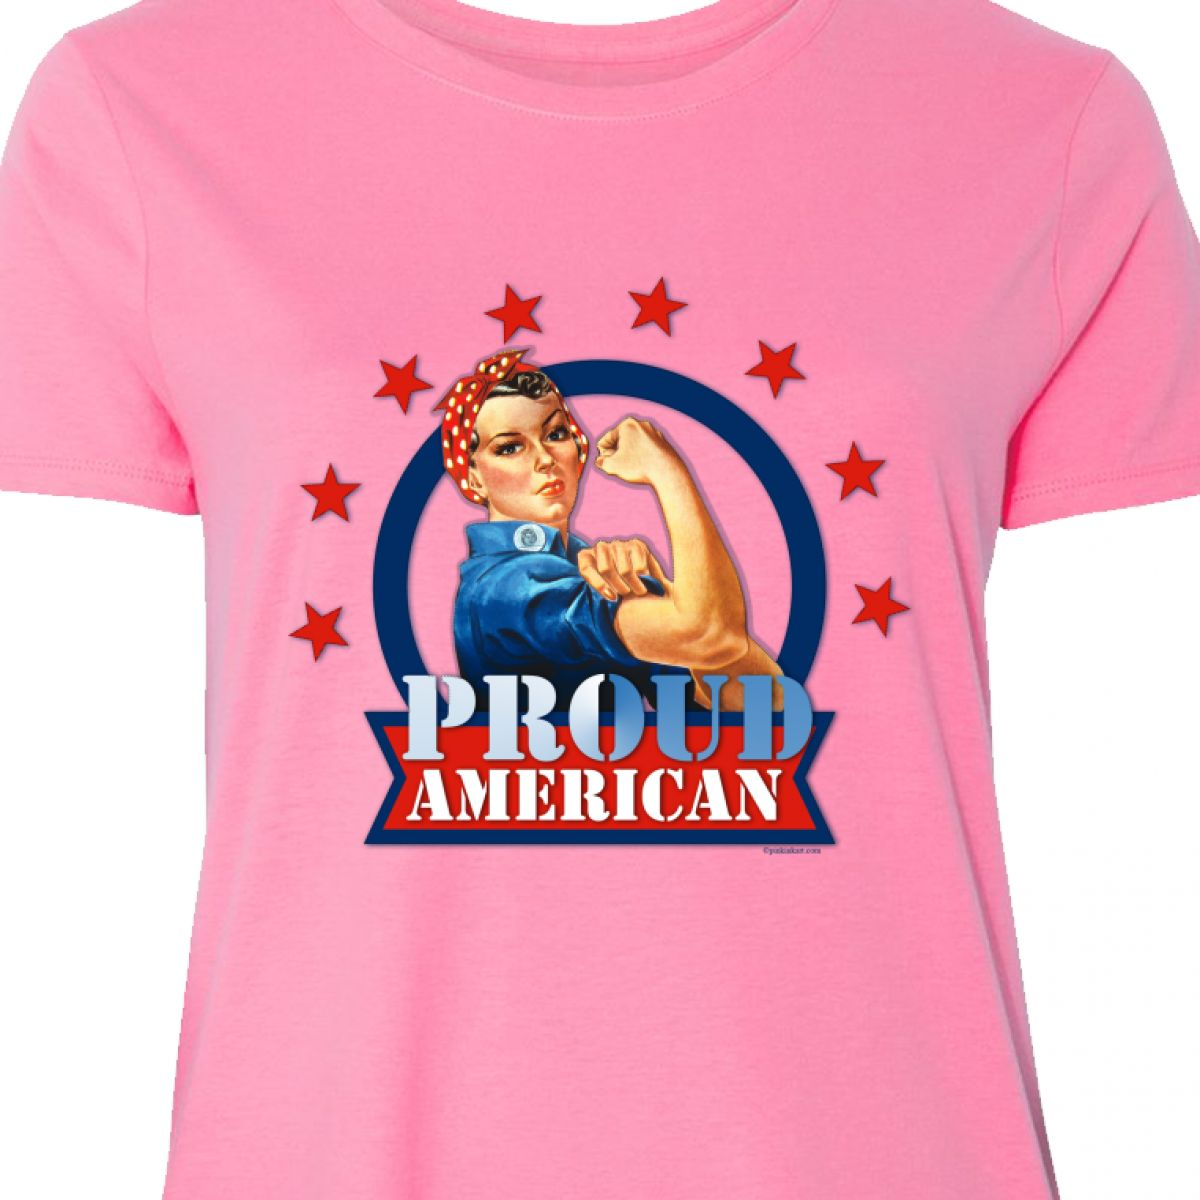 d2b7326e5 Inktastic Rosie Riveter Proud American Women's Plus Size T-Shirt 4th ...